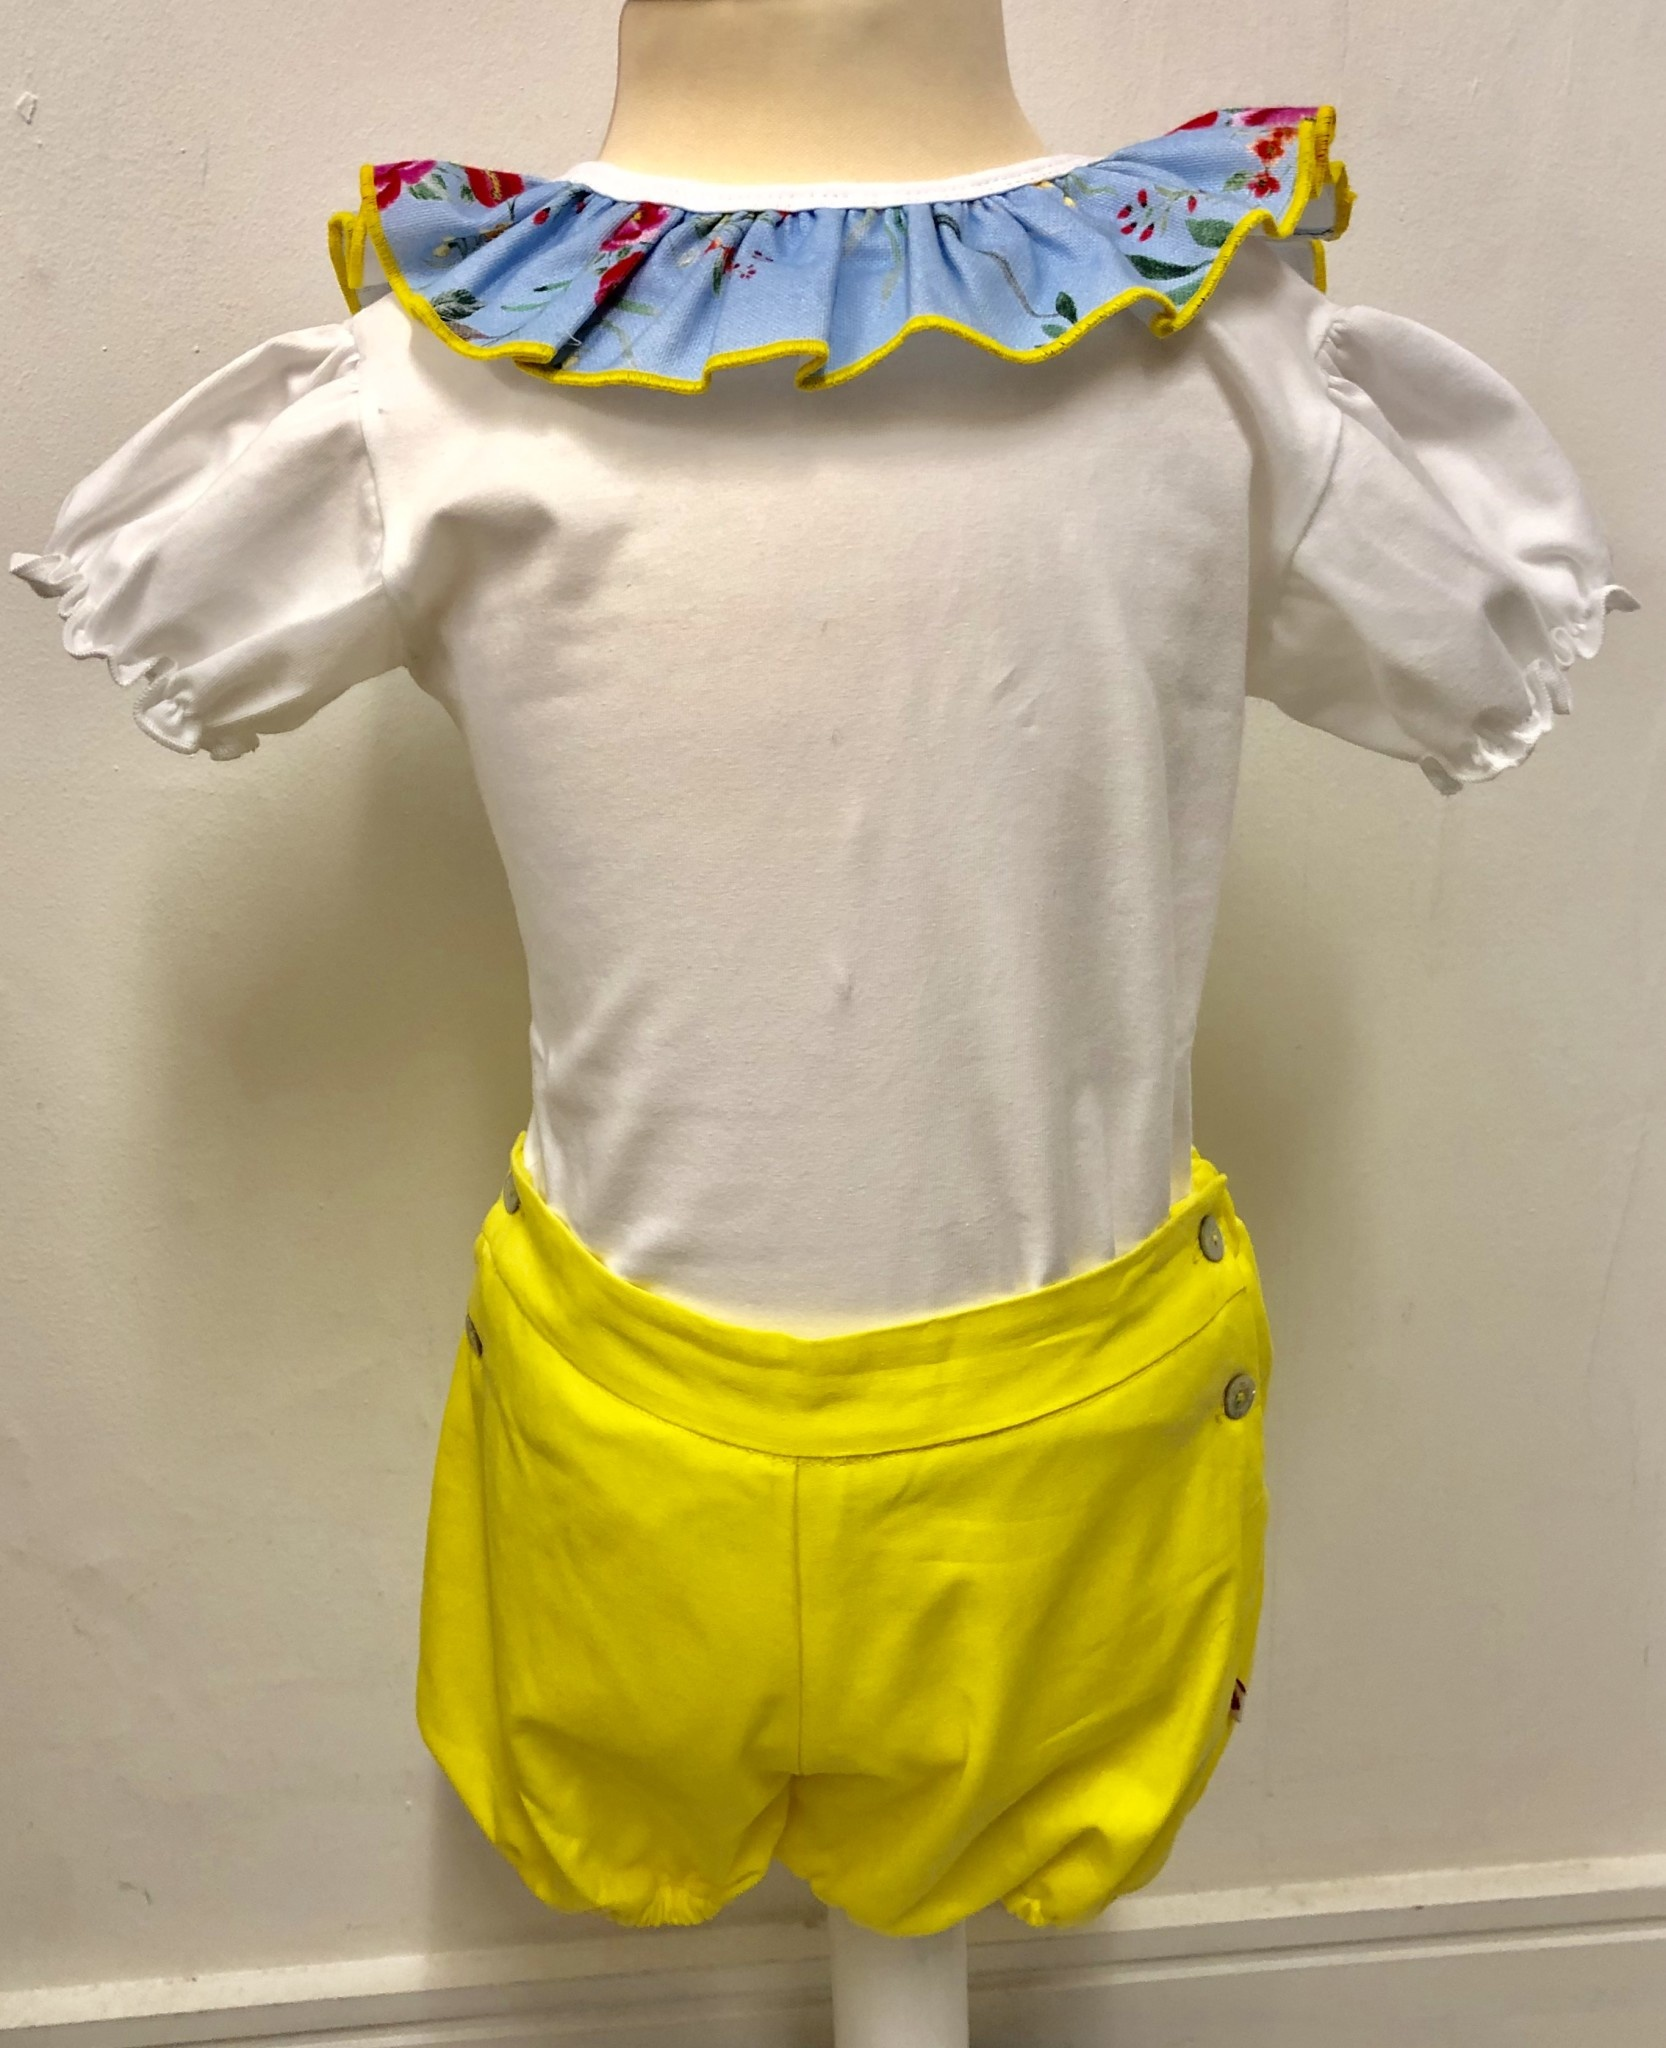 Bogoleta Bogoleta Yellow Body & Short Set With Floral Trim